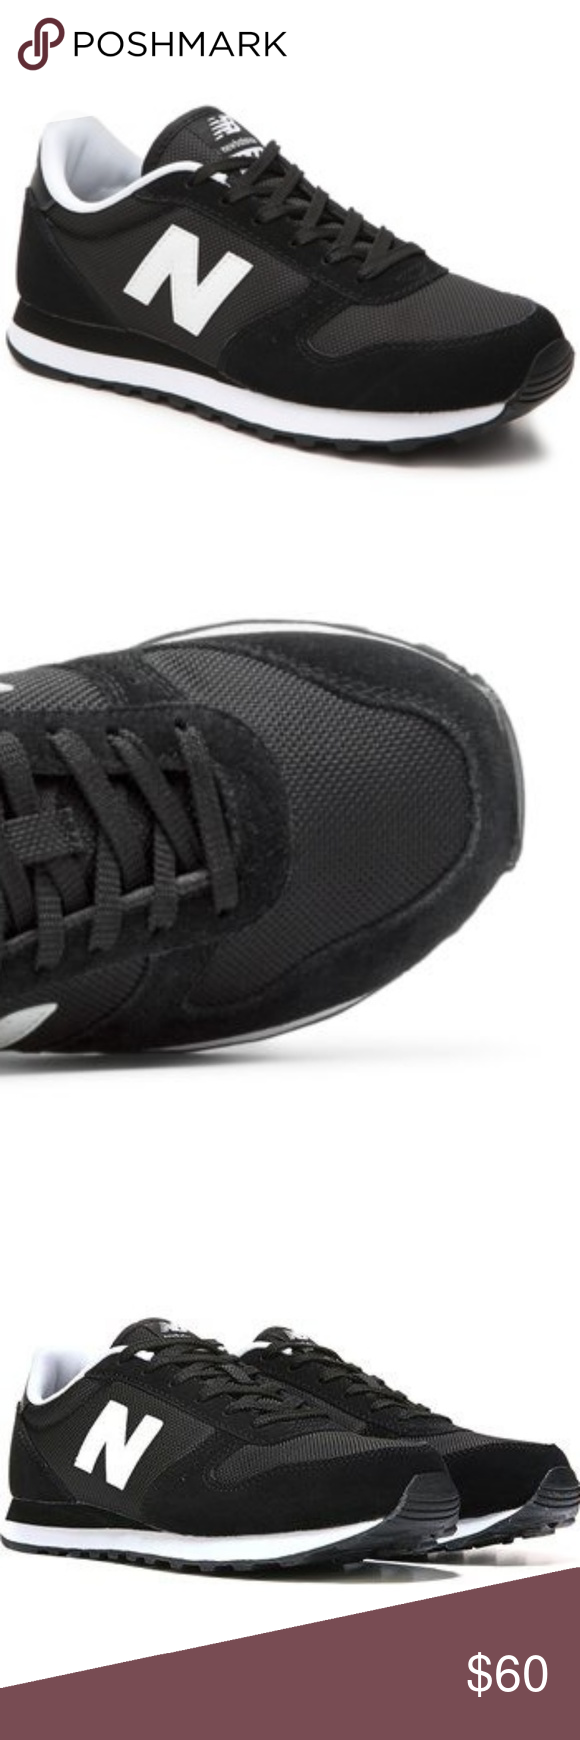 New Balance 311 Modern Classic Size 6.5